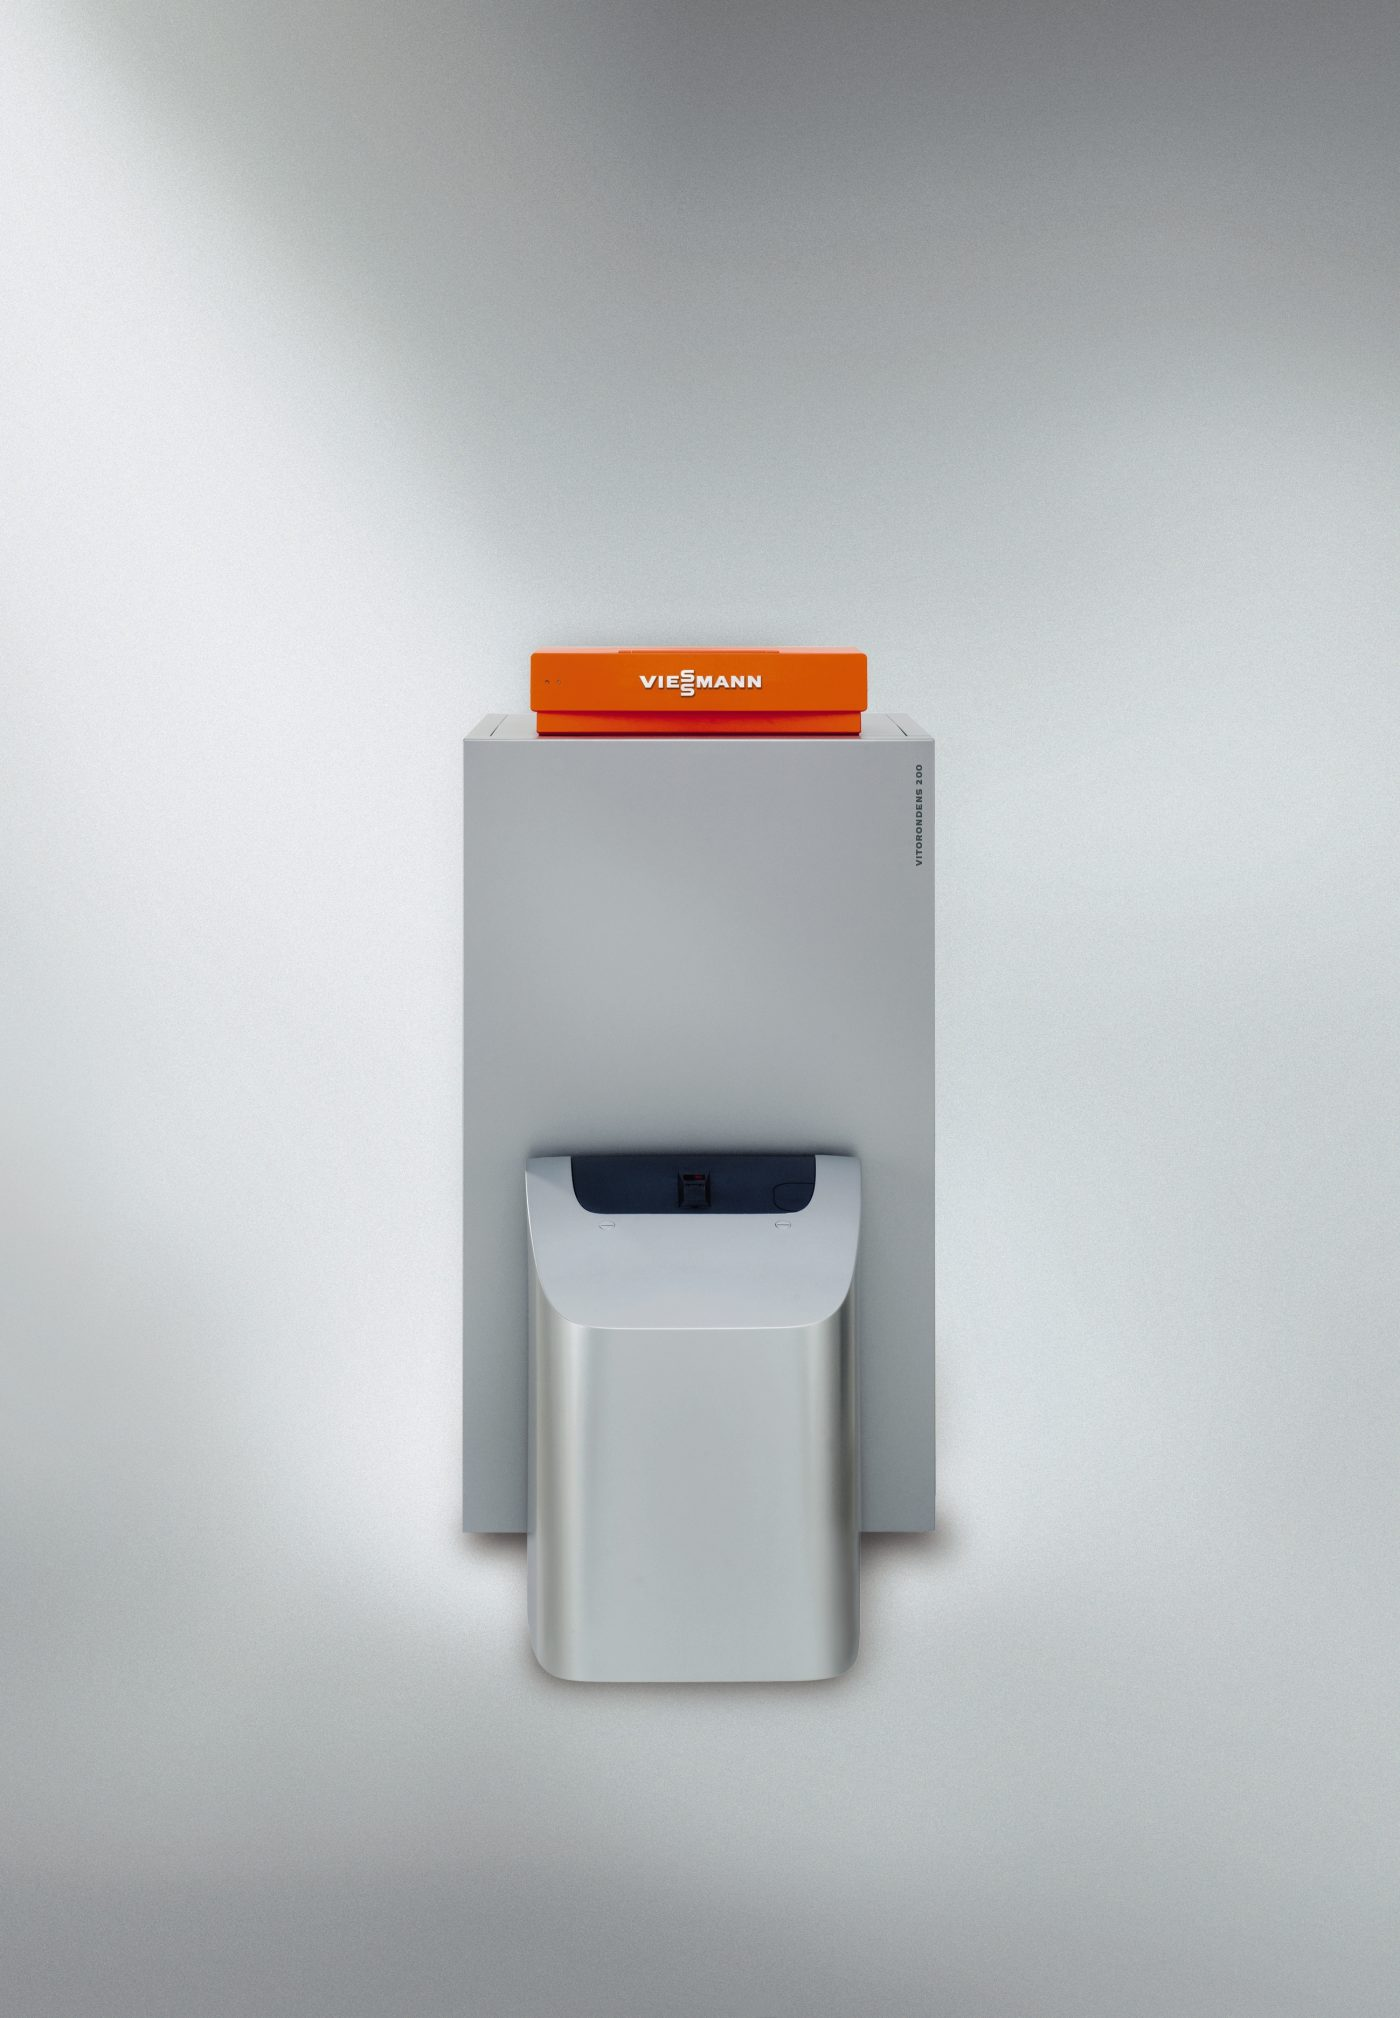 Heizsysteme – Seyb GmbH